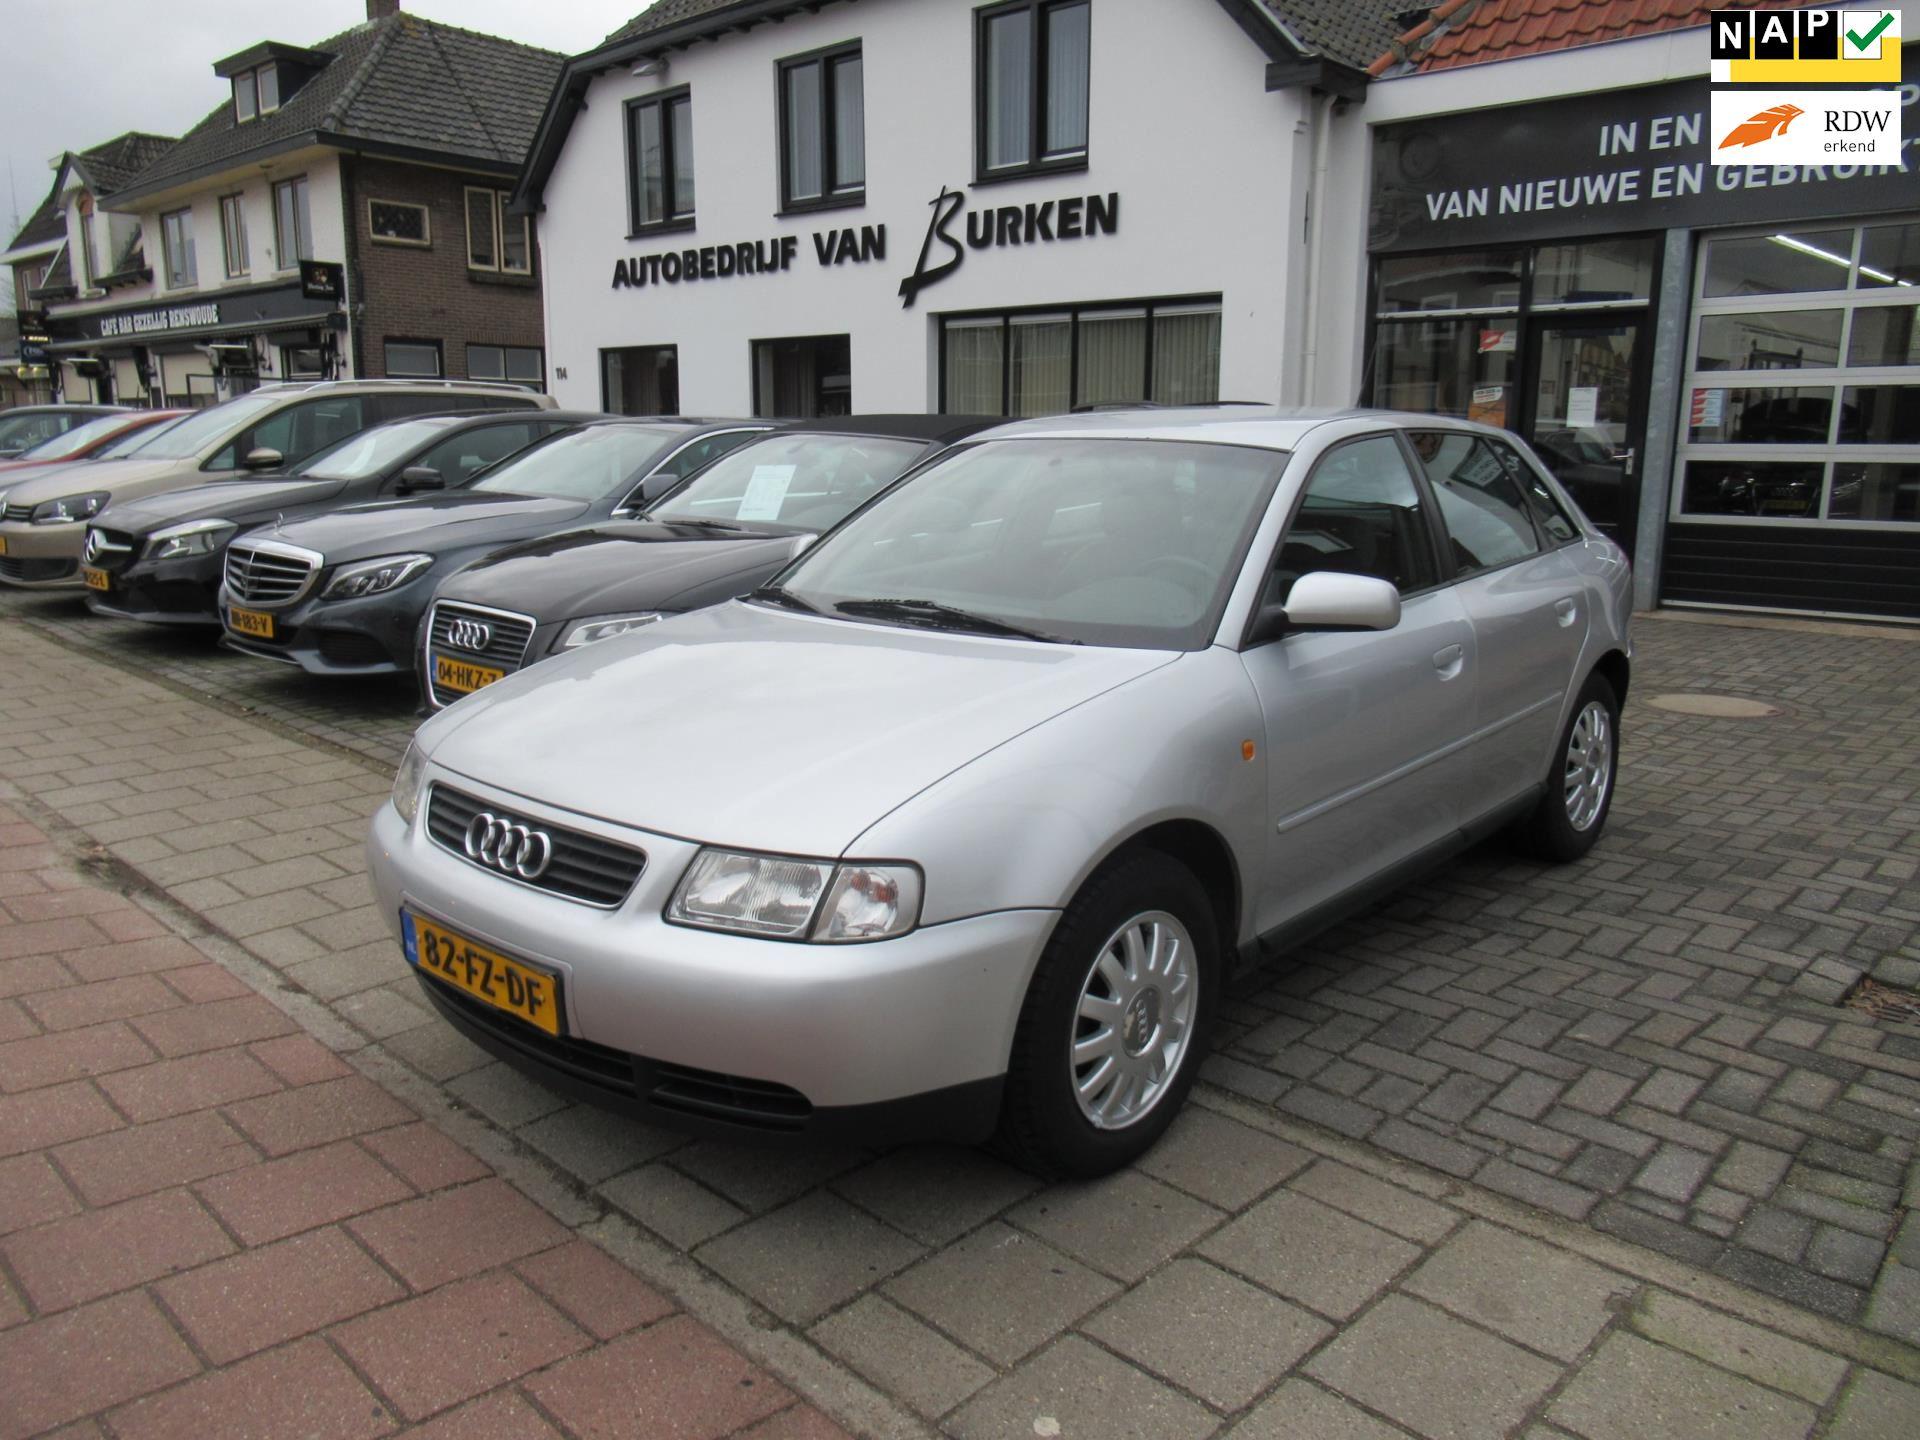 Audi A3 occasion - Autobedrijf van Burken